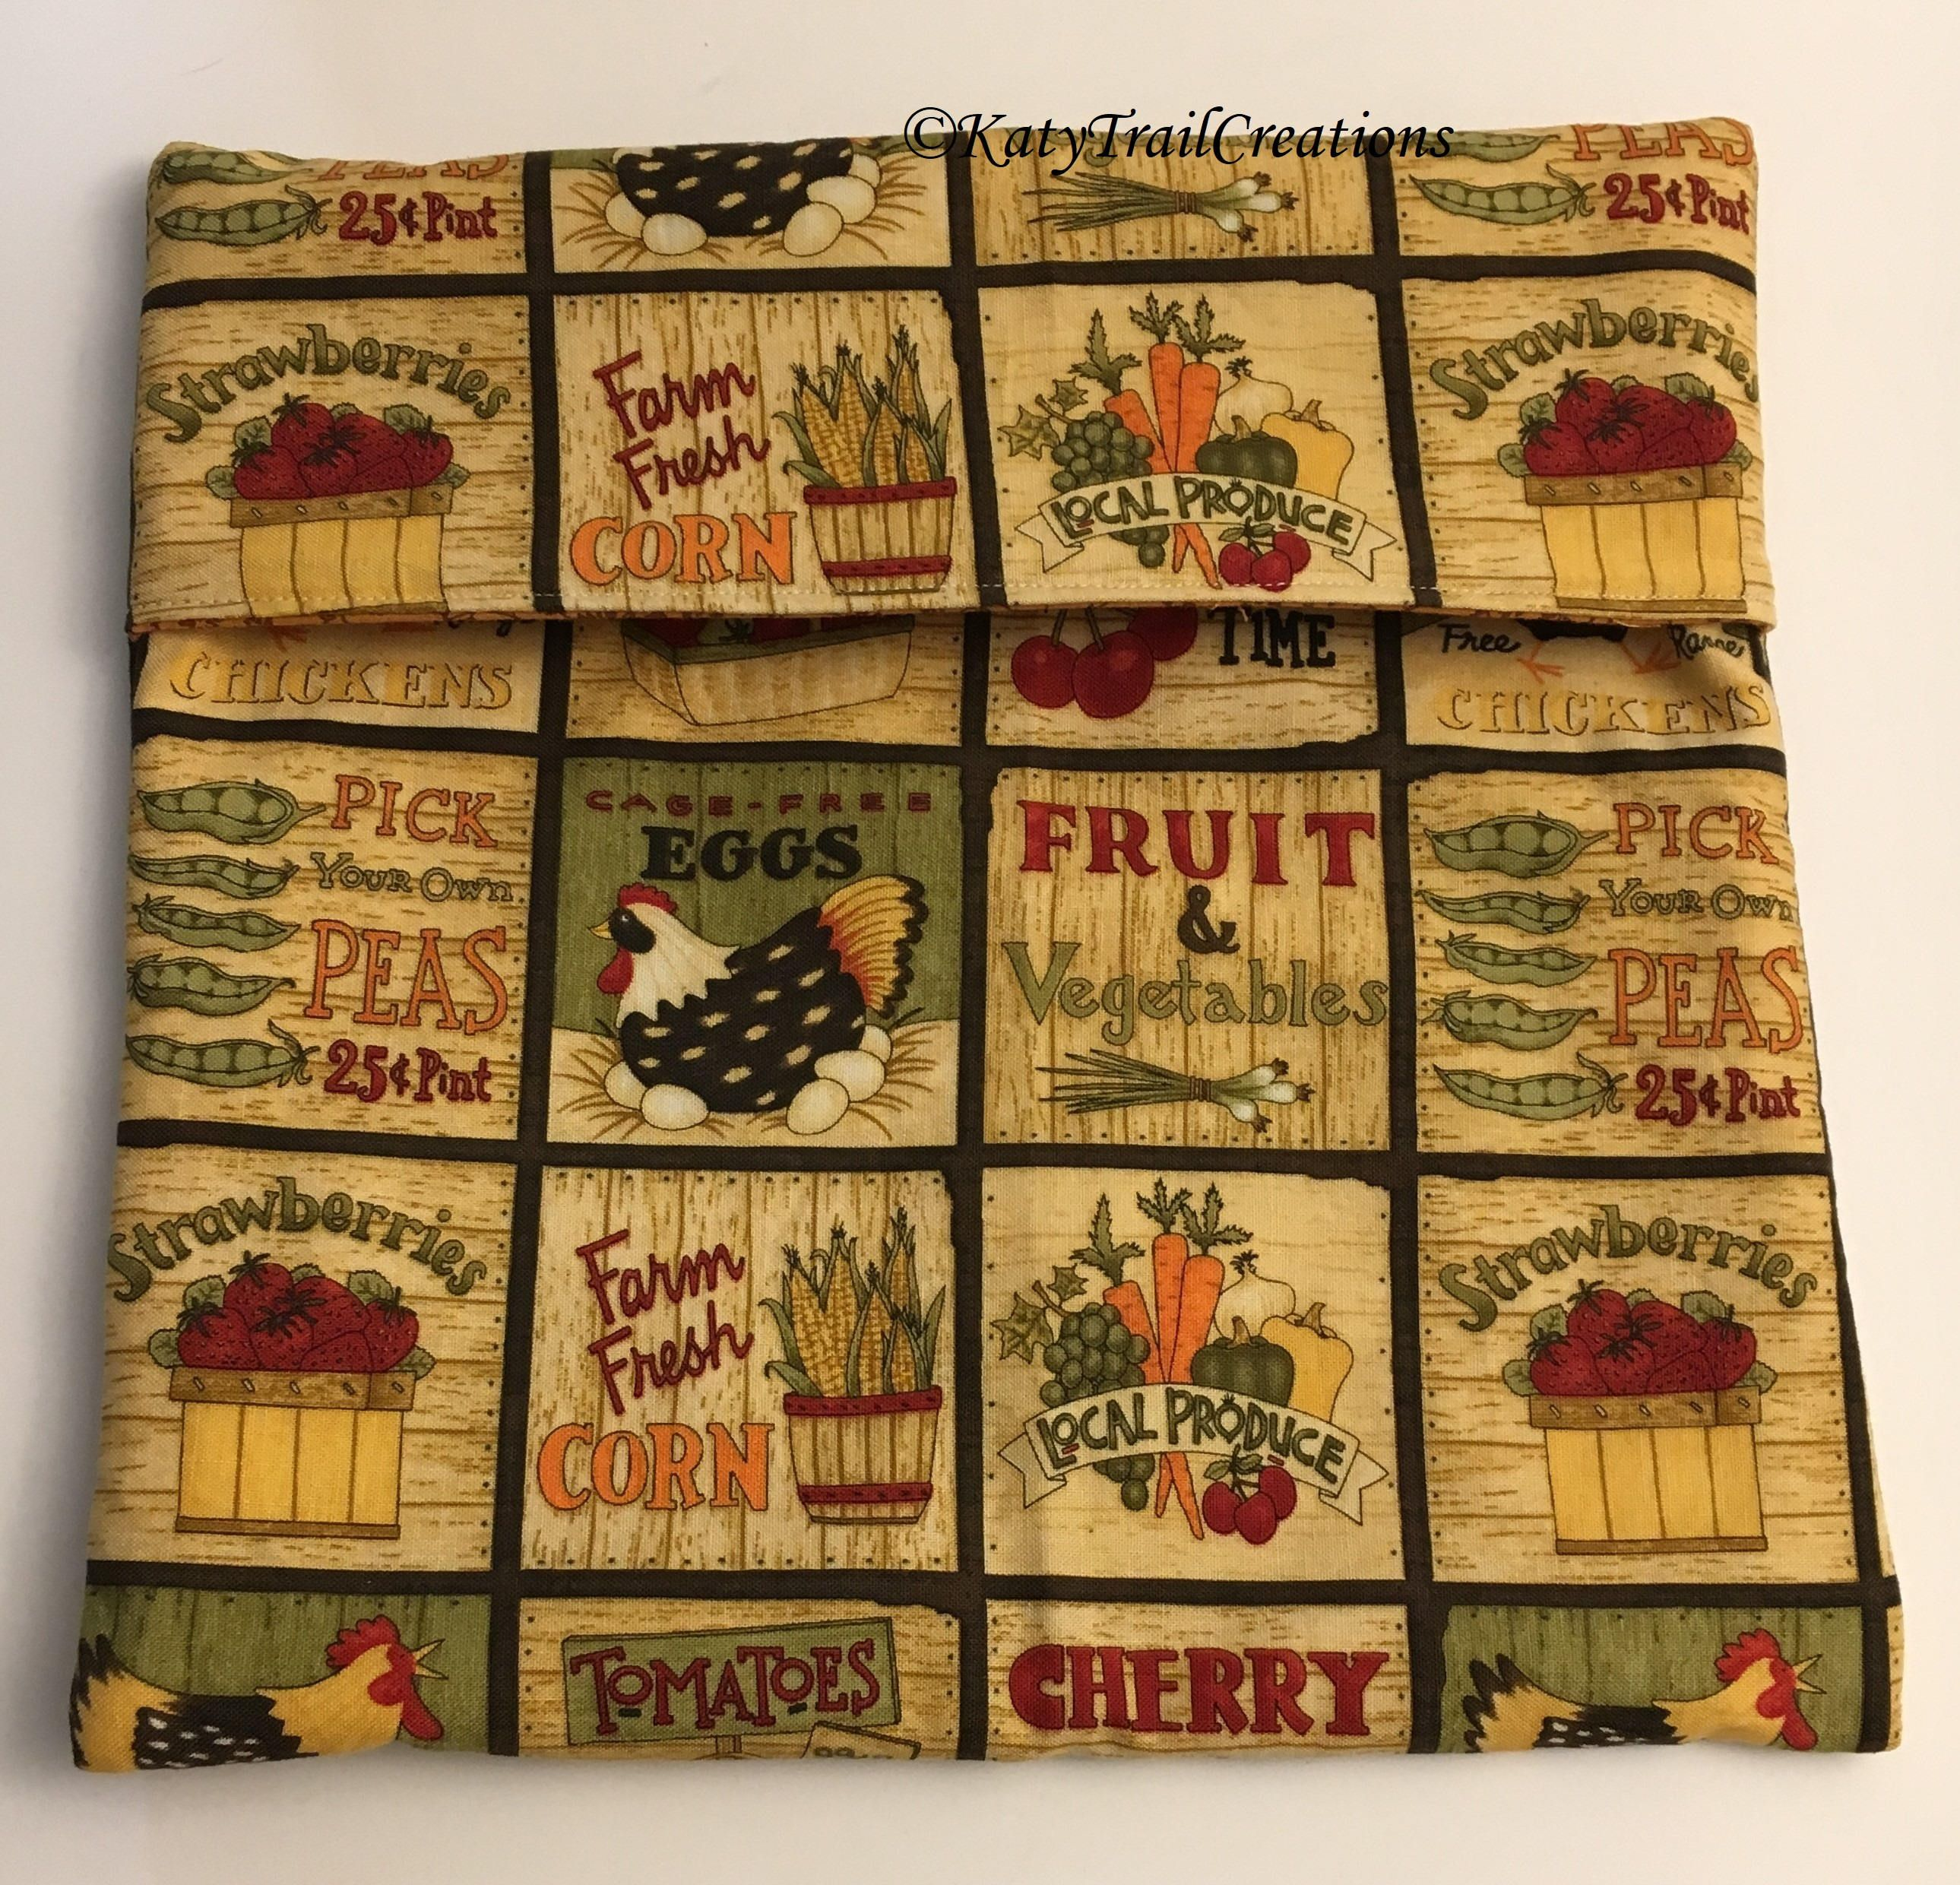 Microwave Potato Bag Tortilla Warmer Farmer S Market Fabric By Katytrailcreations On Etsy